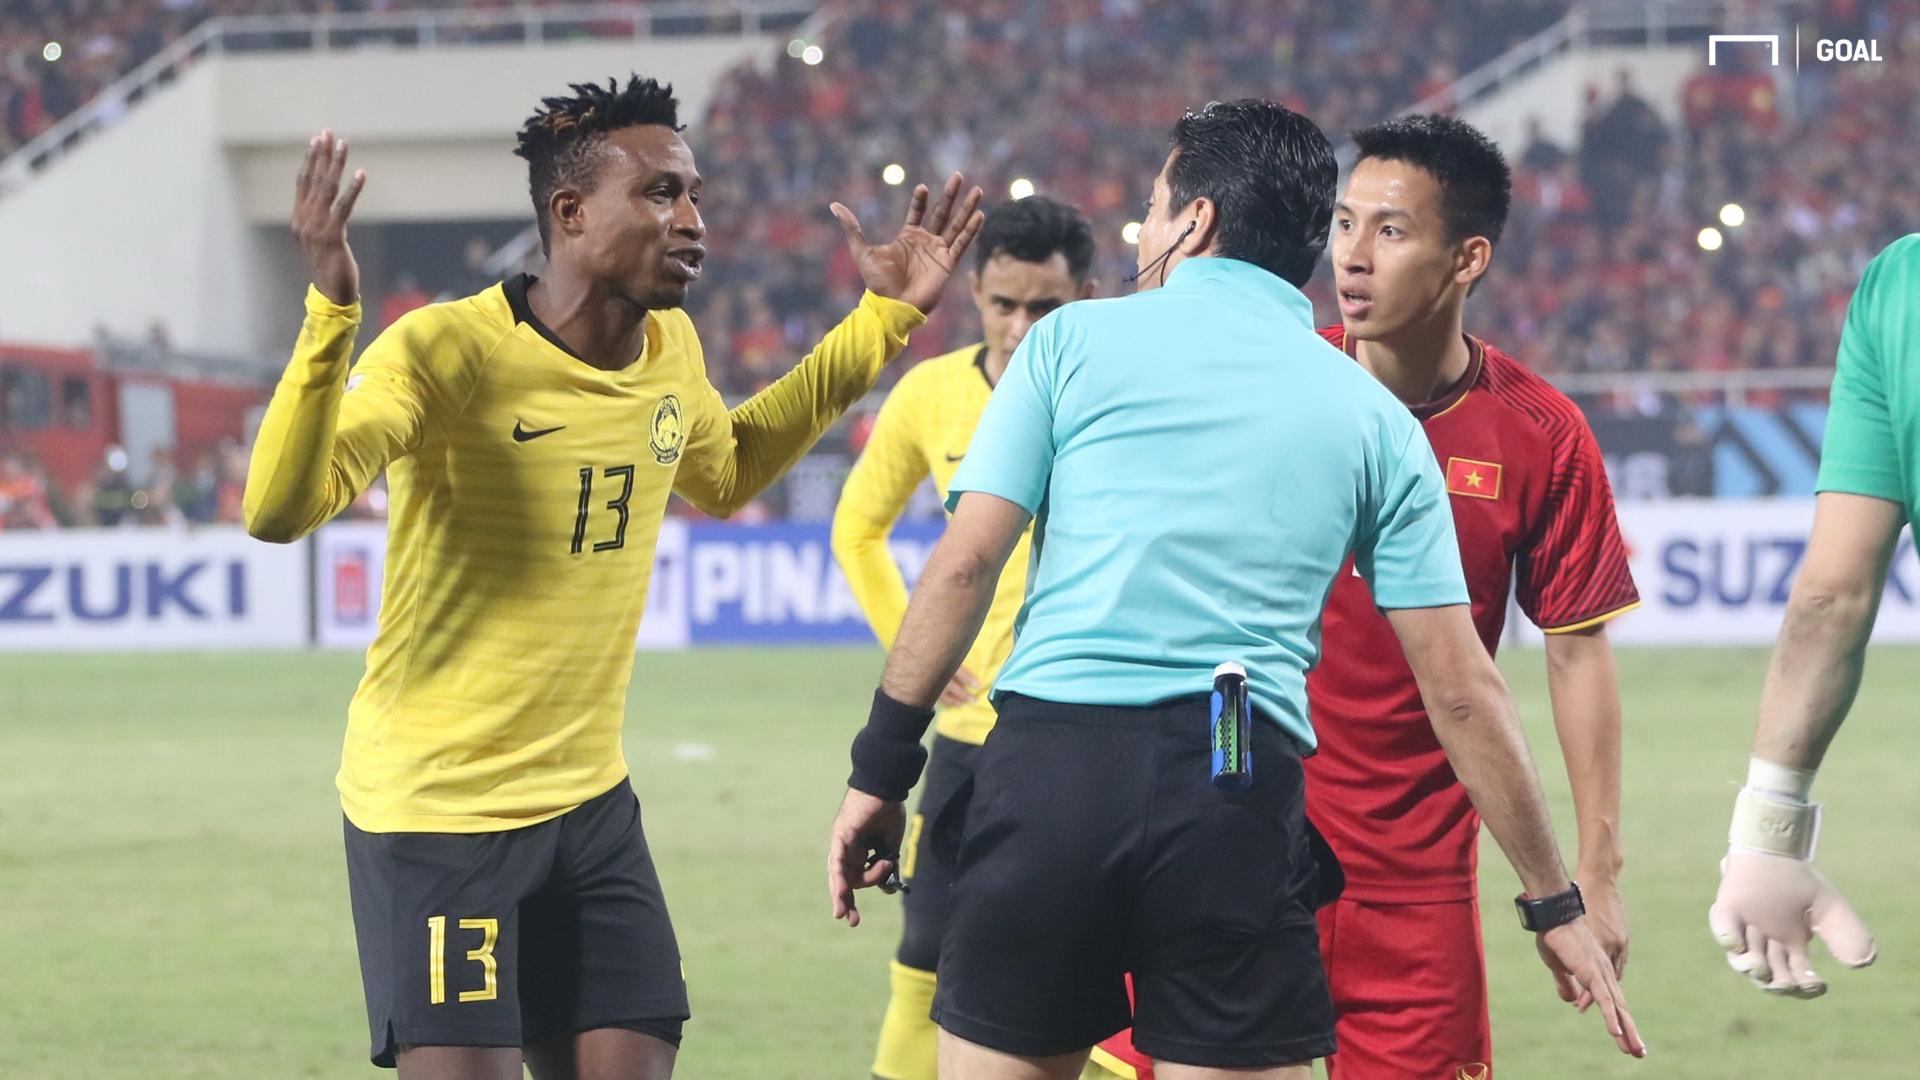 Alireza Faghani referee Vietnam Malaysia AFF Cup 2018 final